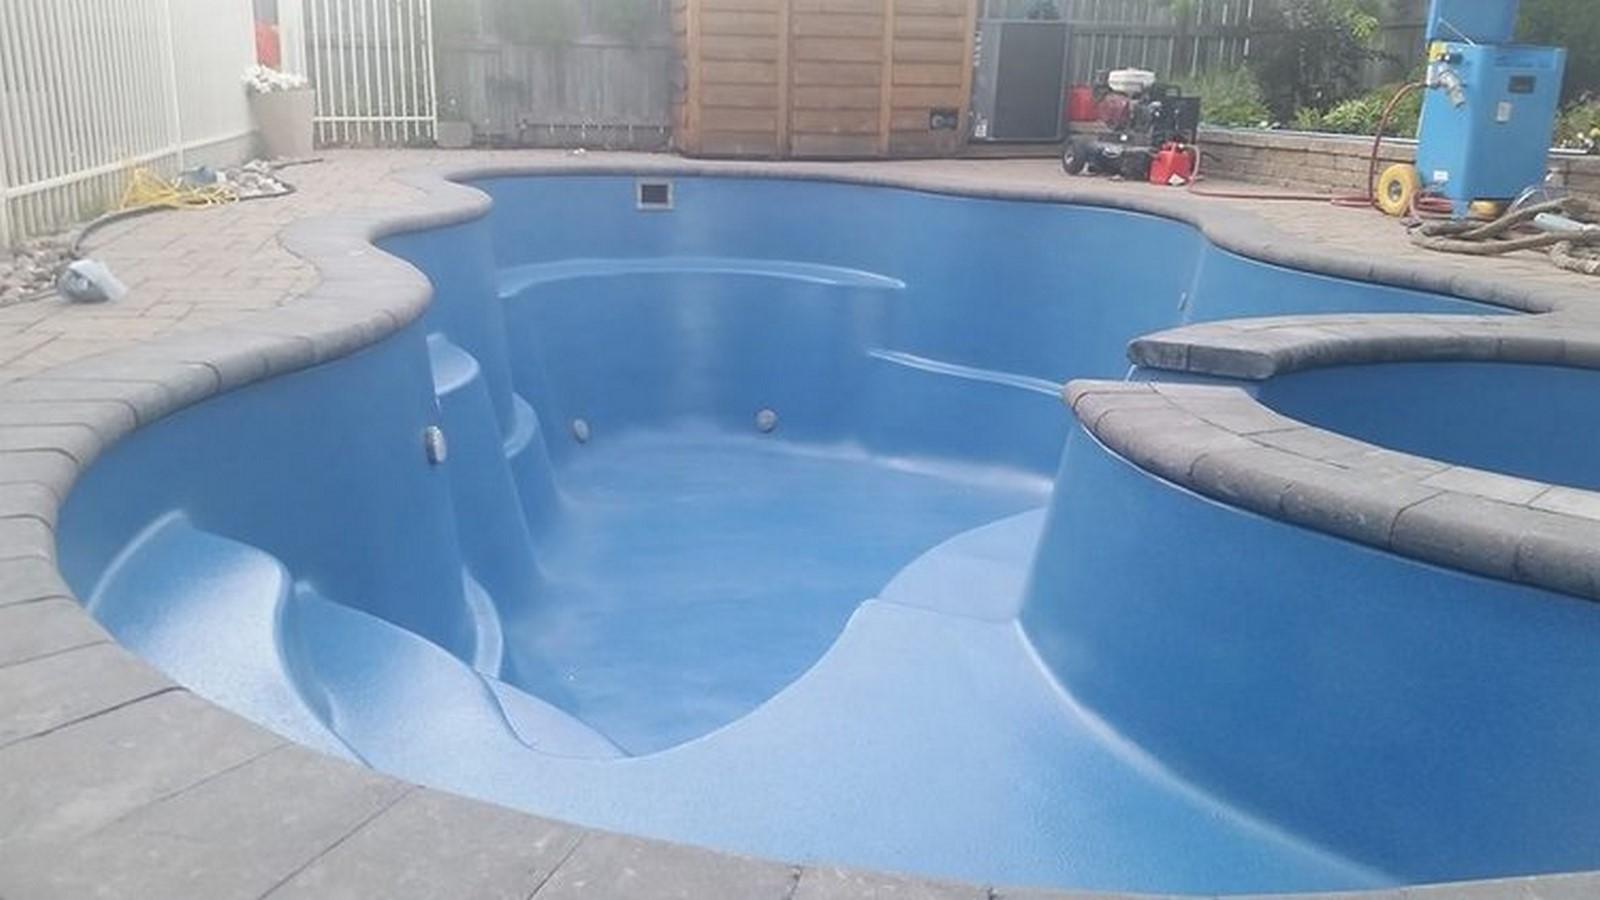 25 flooring patterns for Swimming Pools - Sheet49